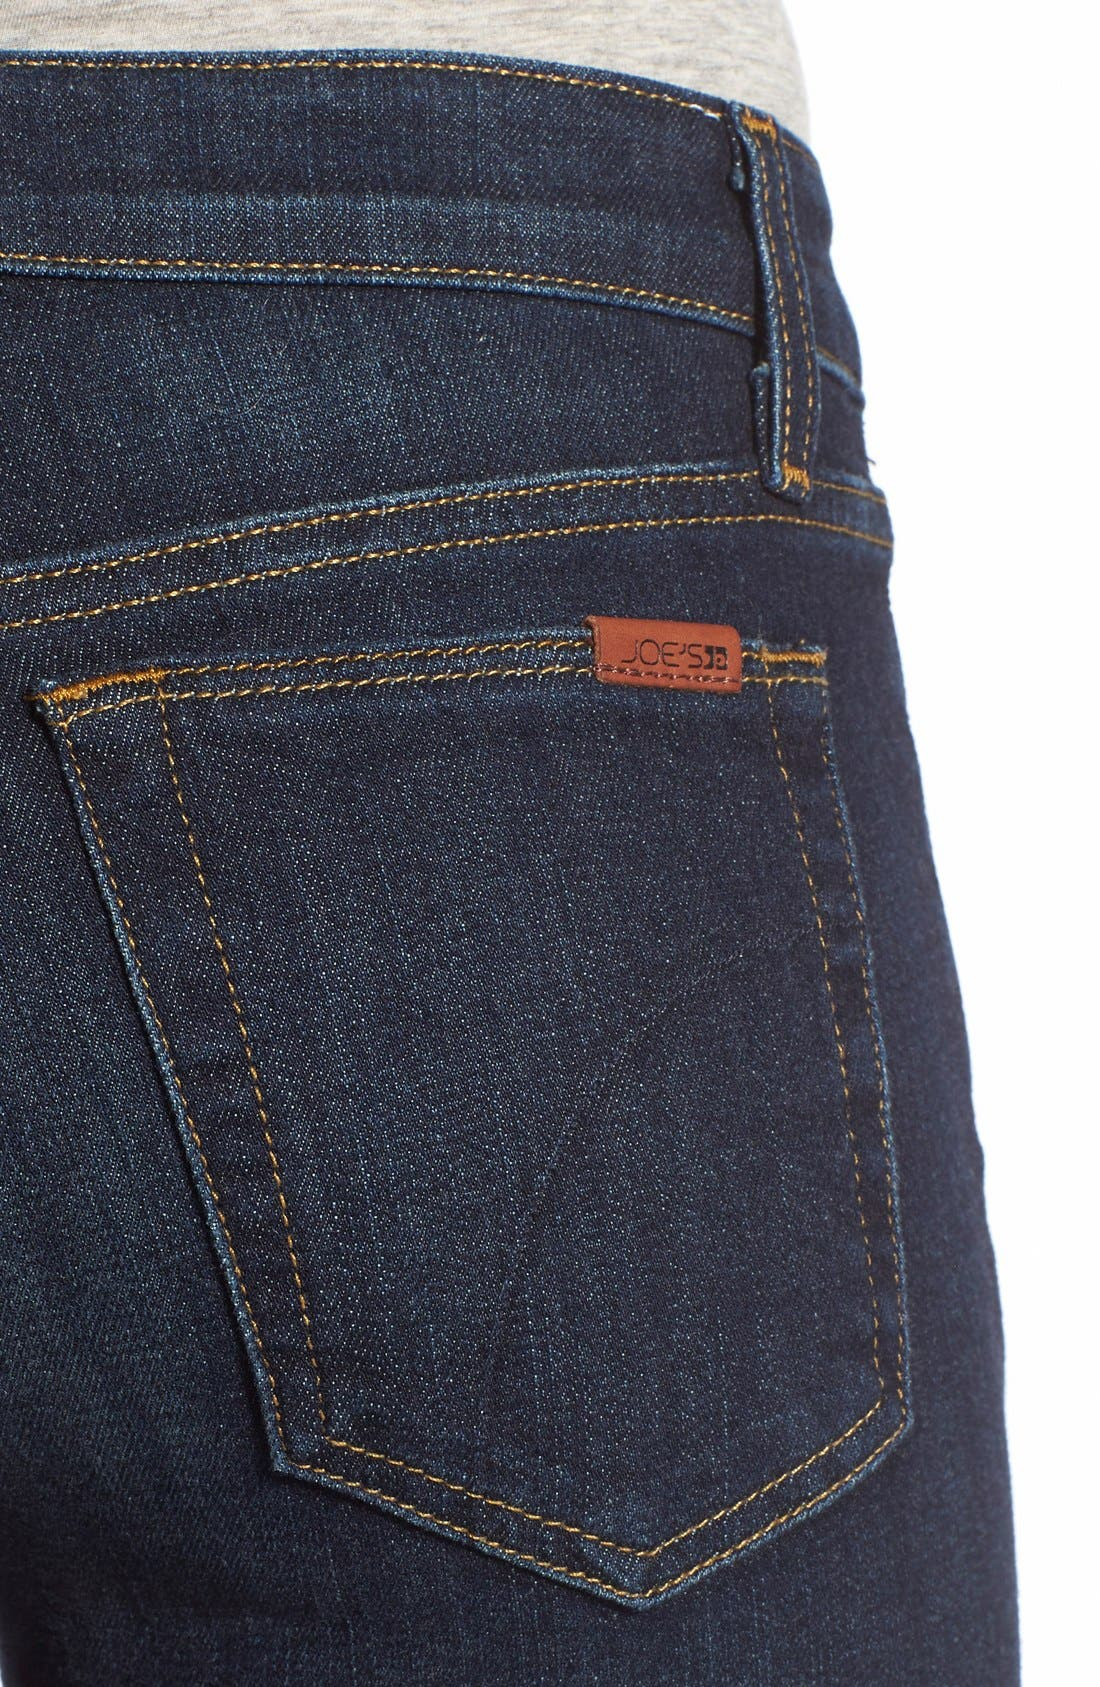 Honey Curvy Bootcut Jeans,                             Alternate thumbnail 4, color,                             Rikki